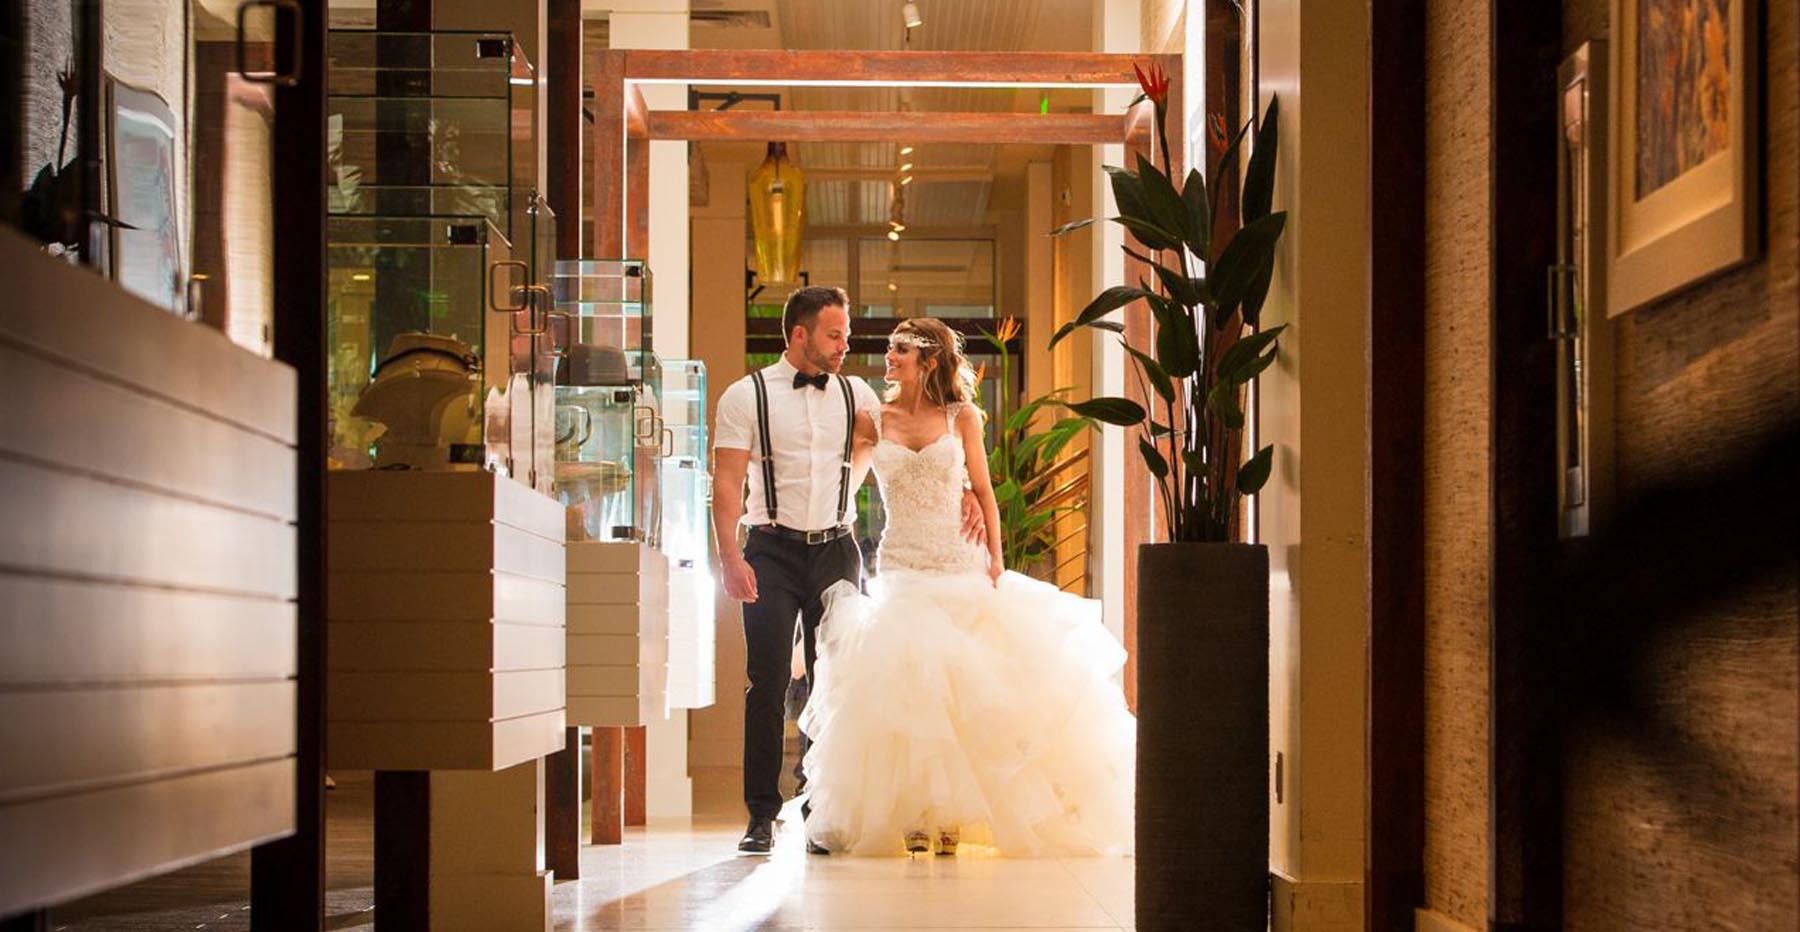 Wedding couple photographed inside down a hallway